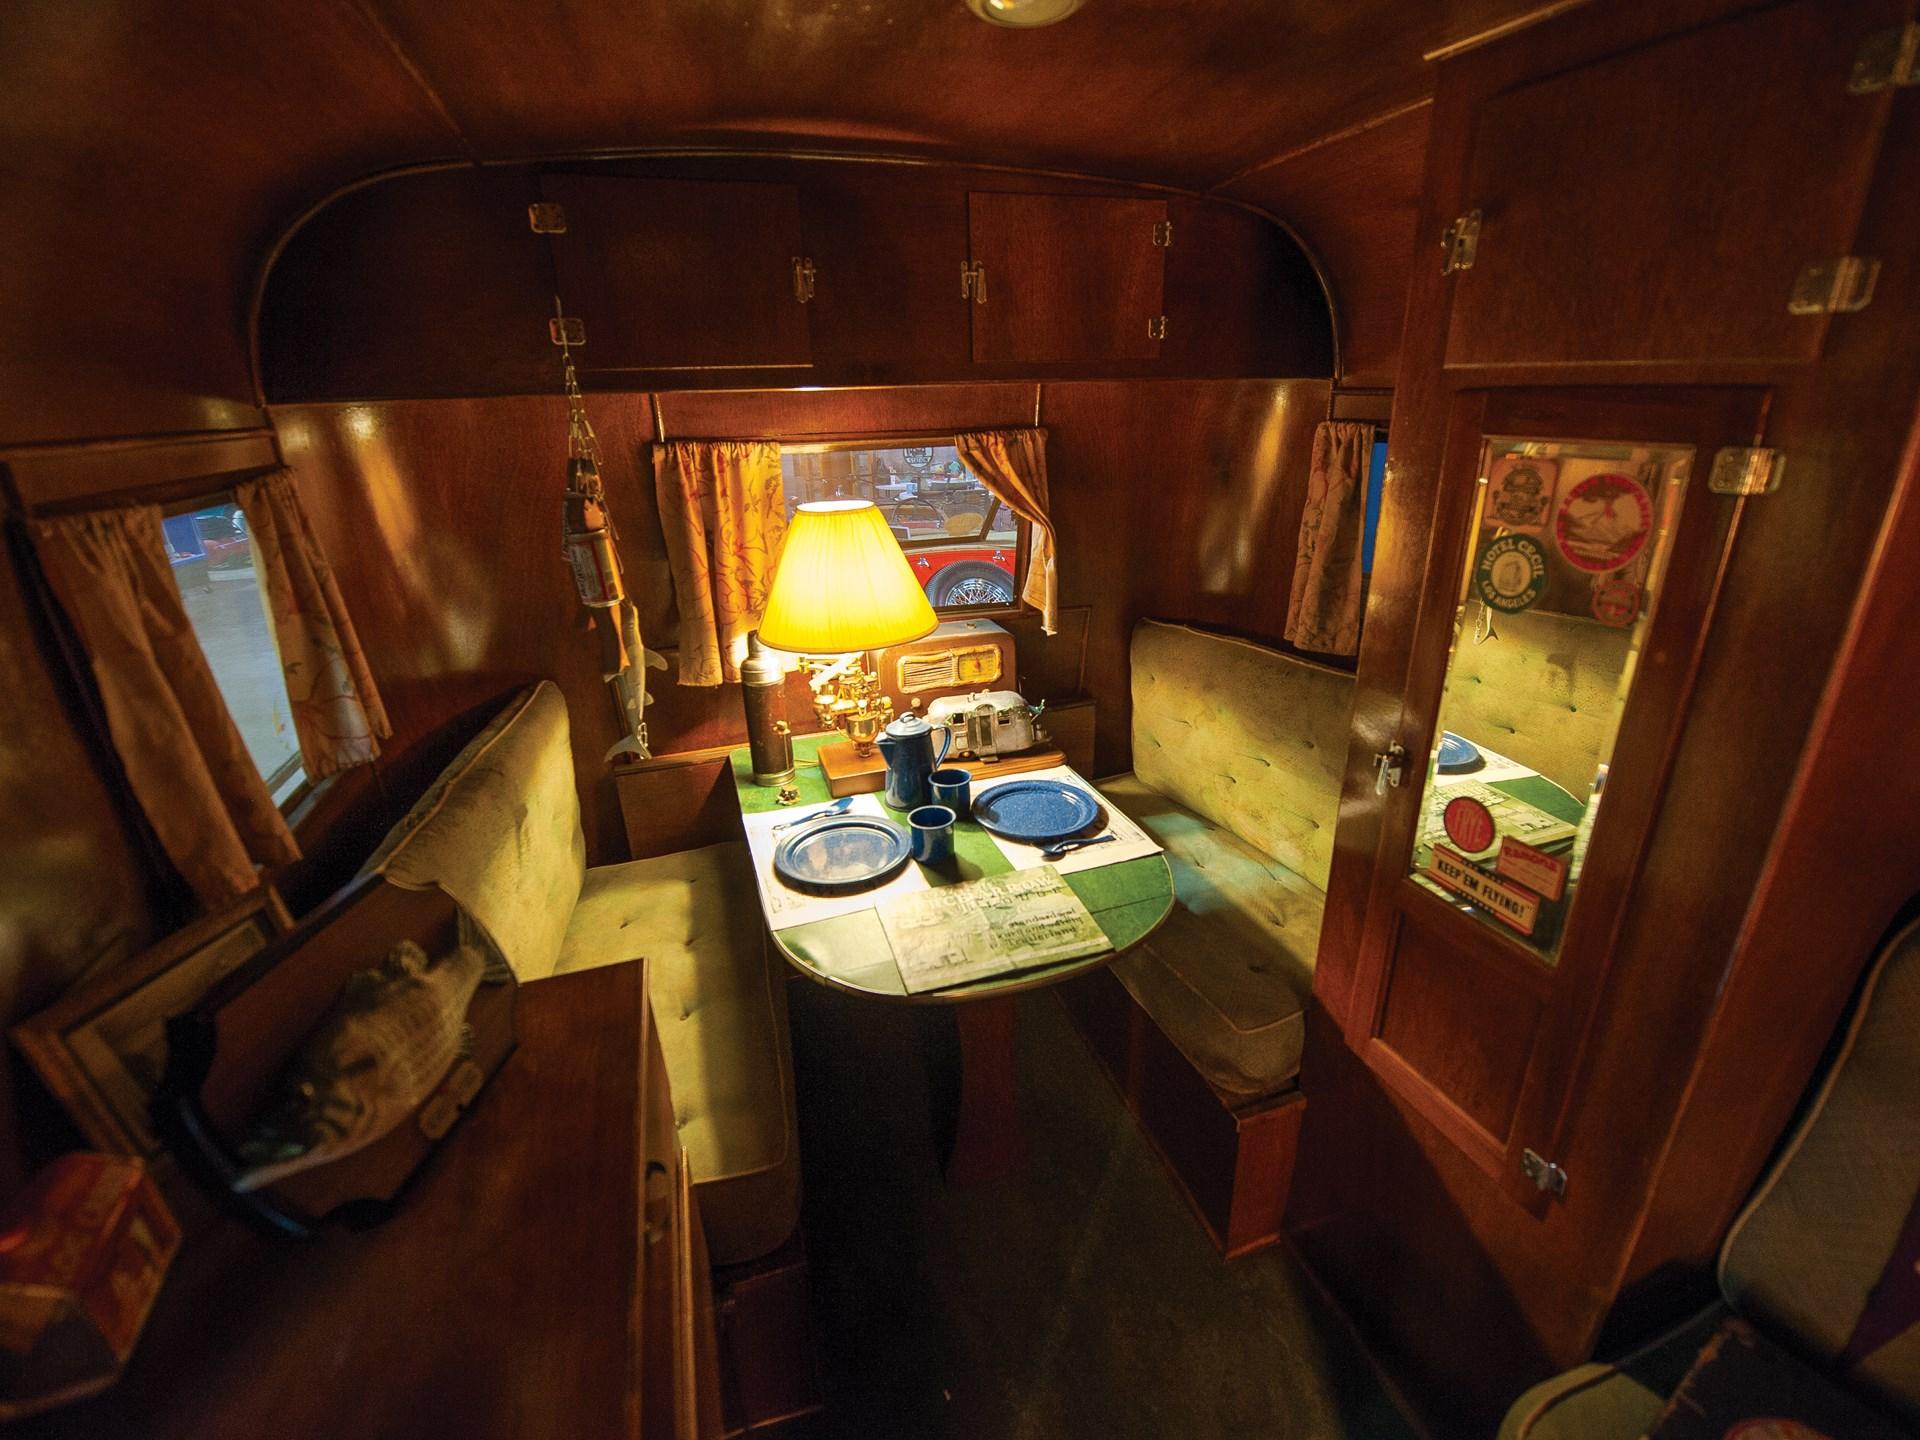 1937 Pierce-Arrow Model C Travelodge kitchen table